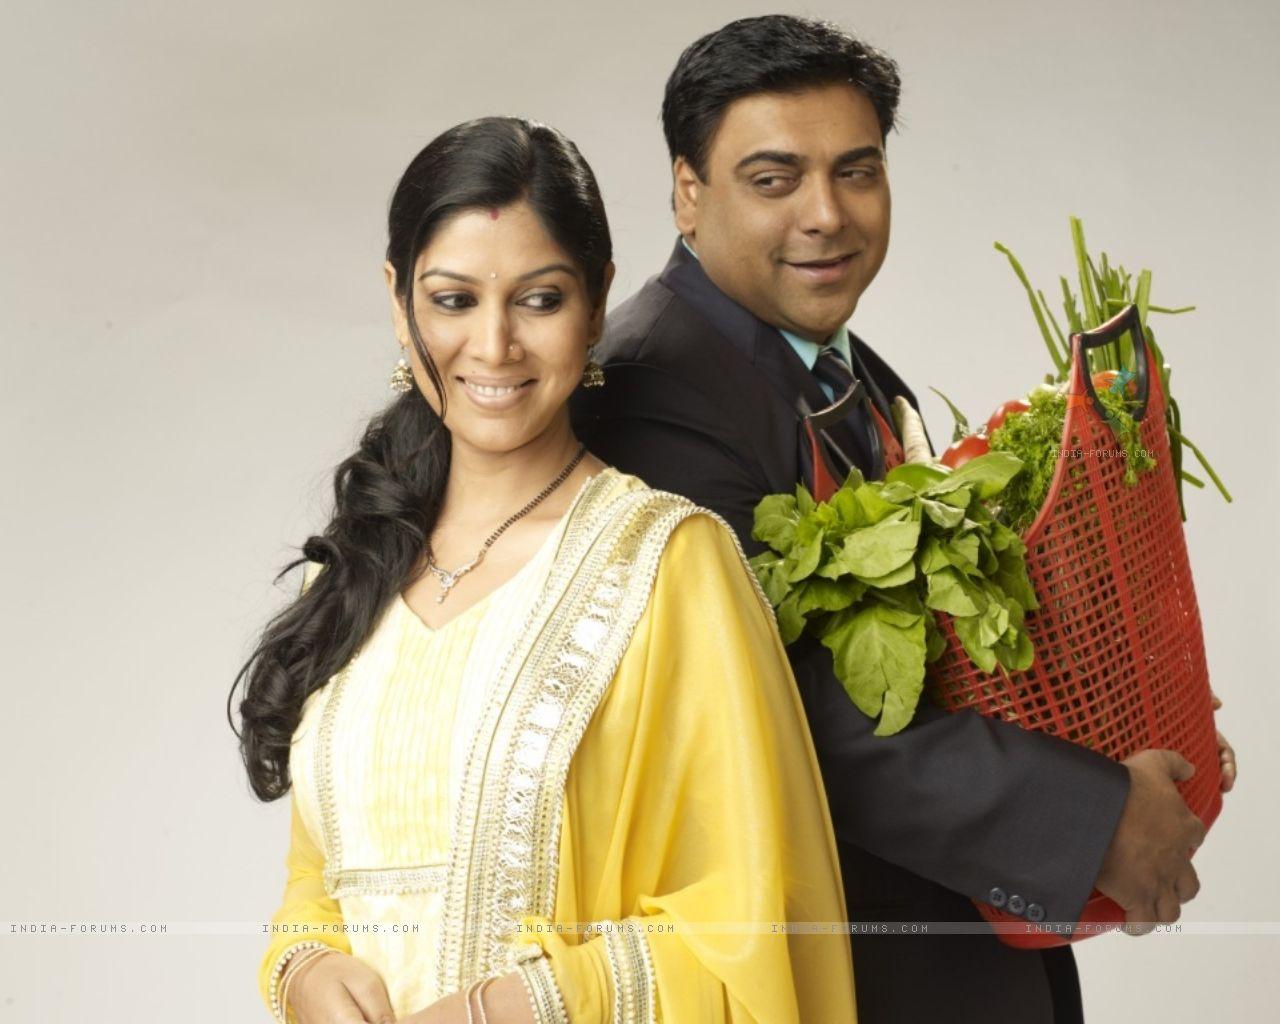 ram and priya meet at wedding